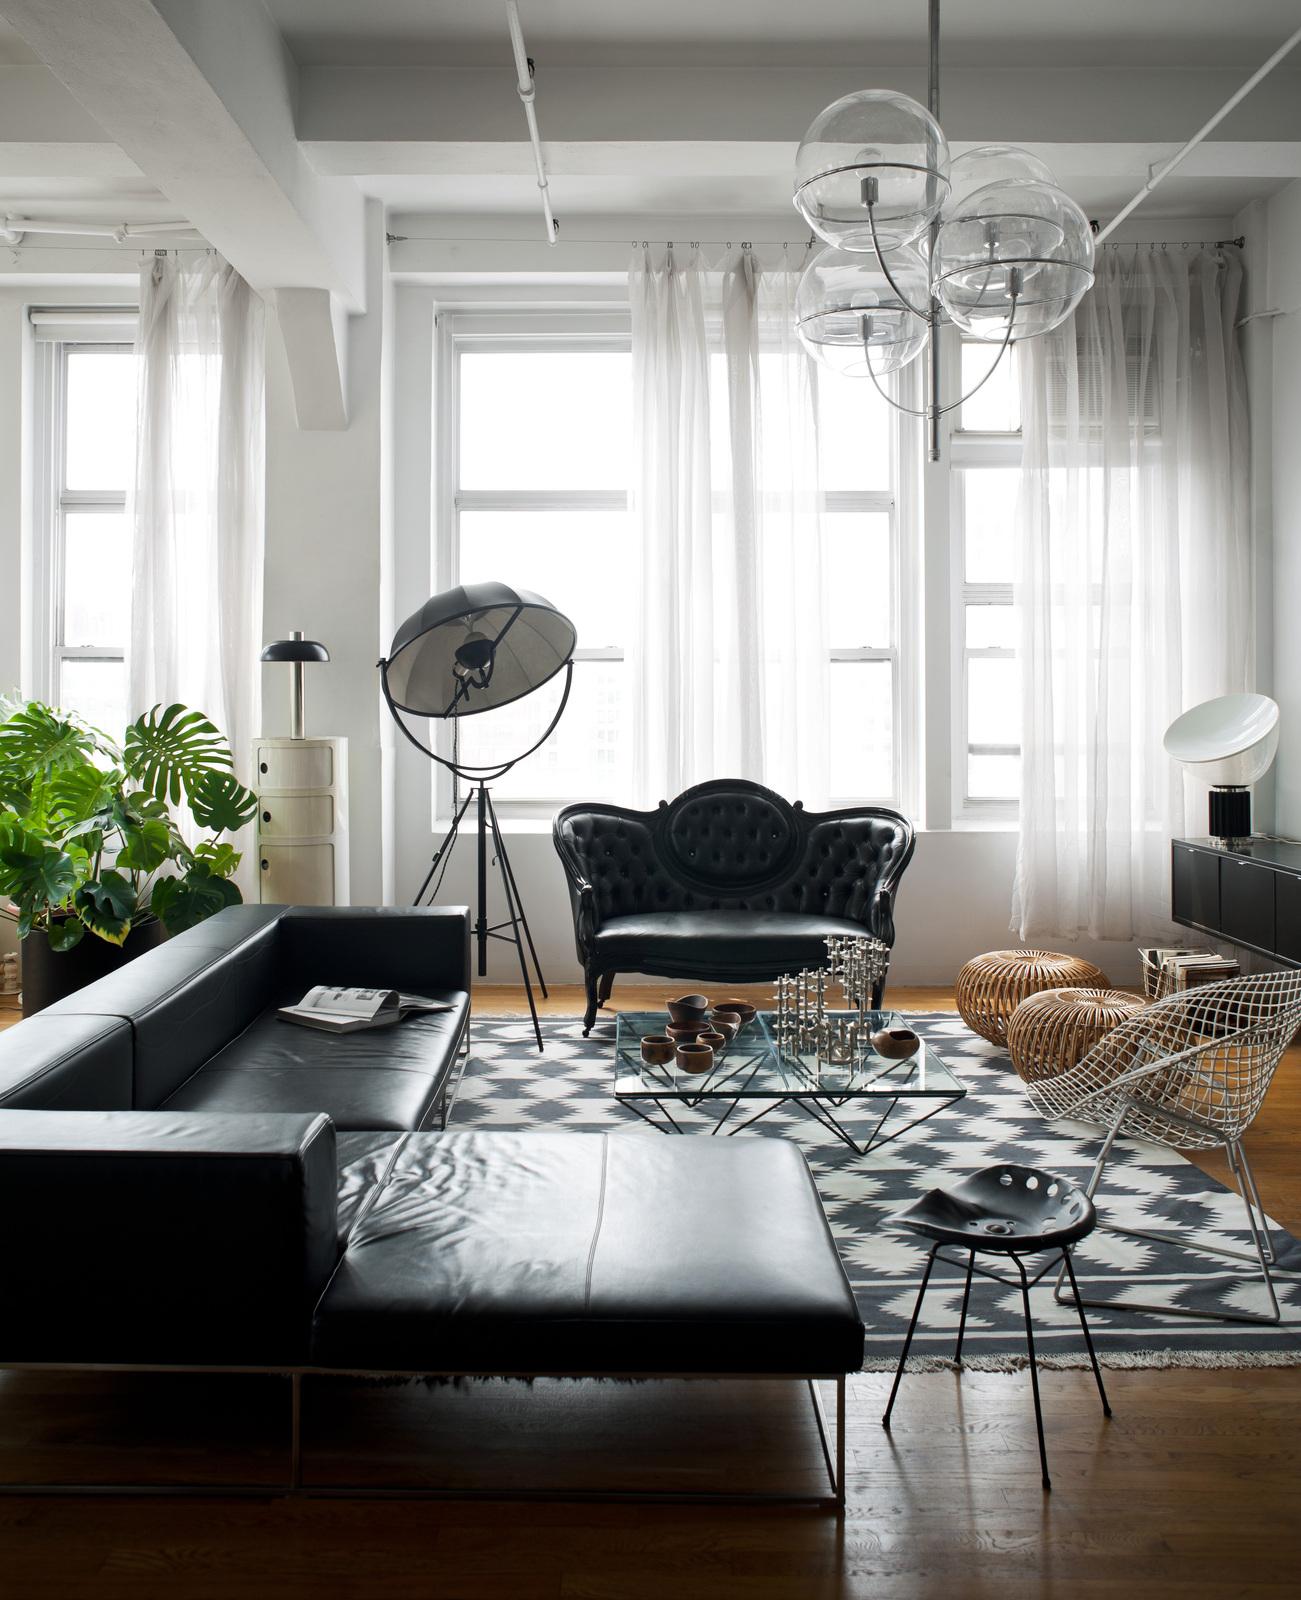 Black furniture interior design photo ideas corner sofa with unusual construction and the ottoman